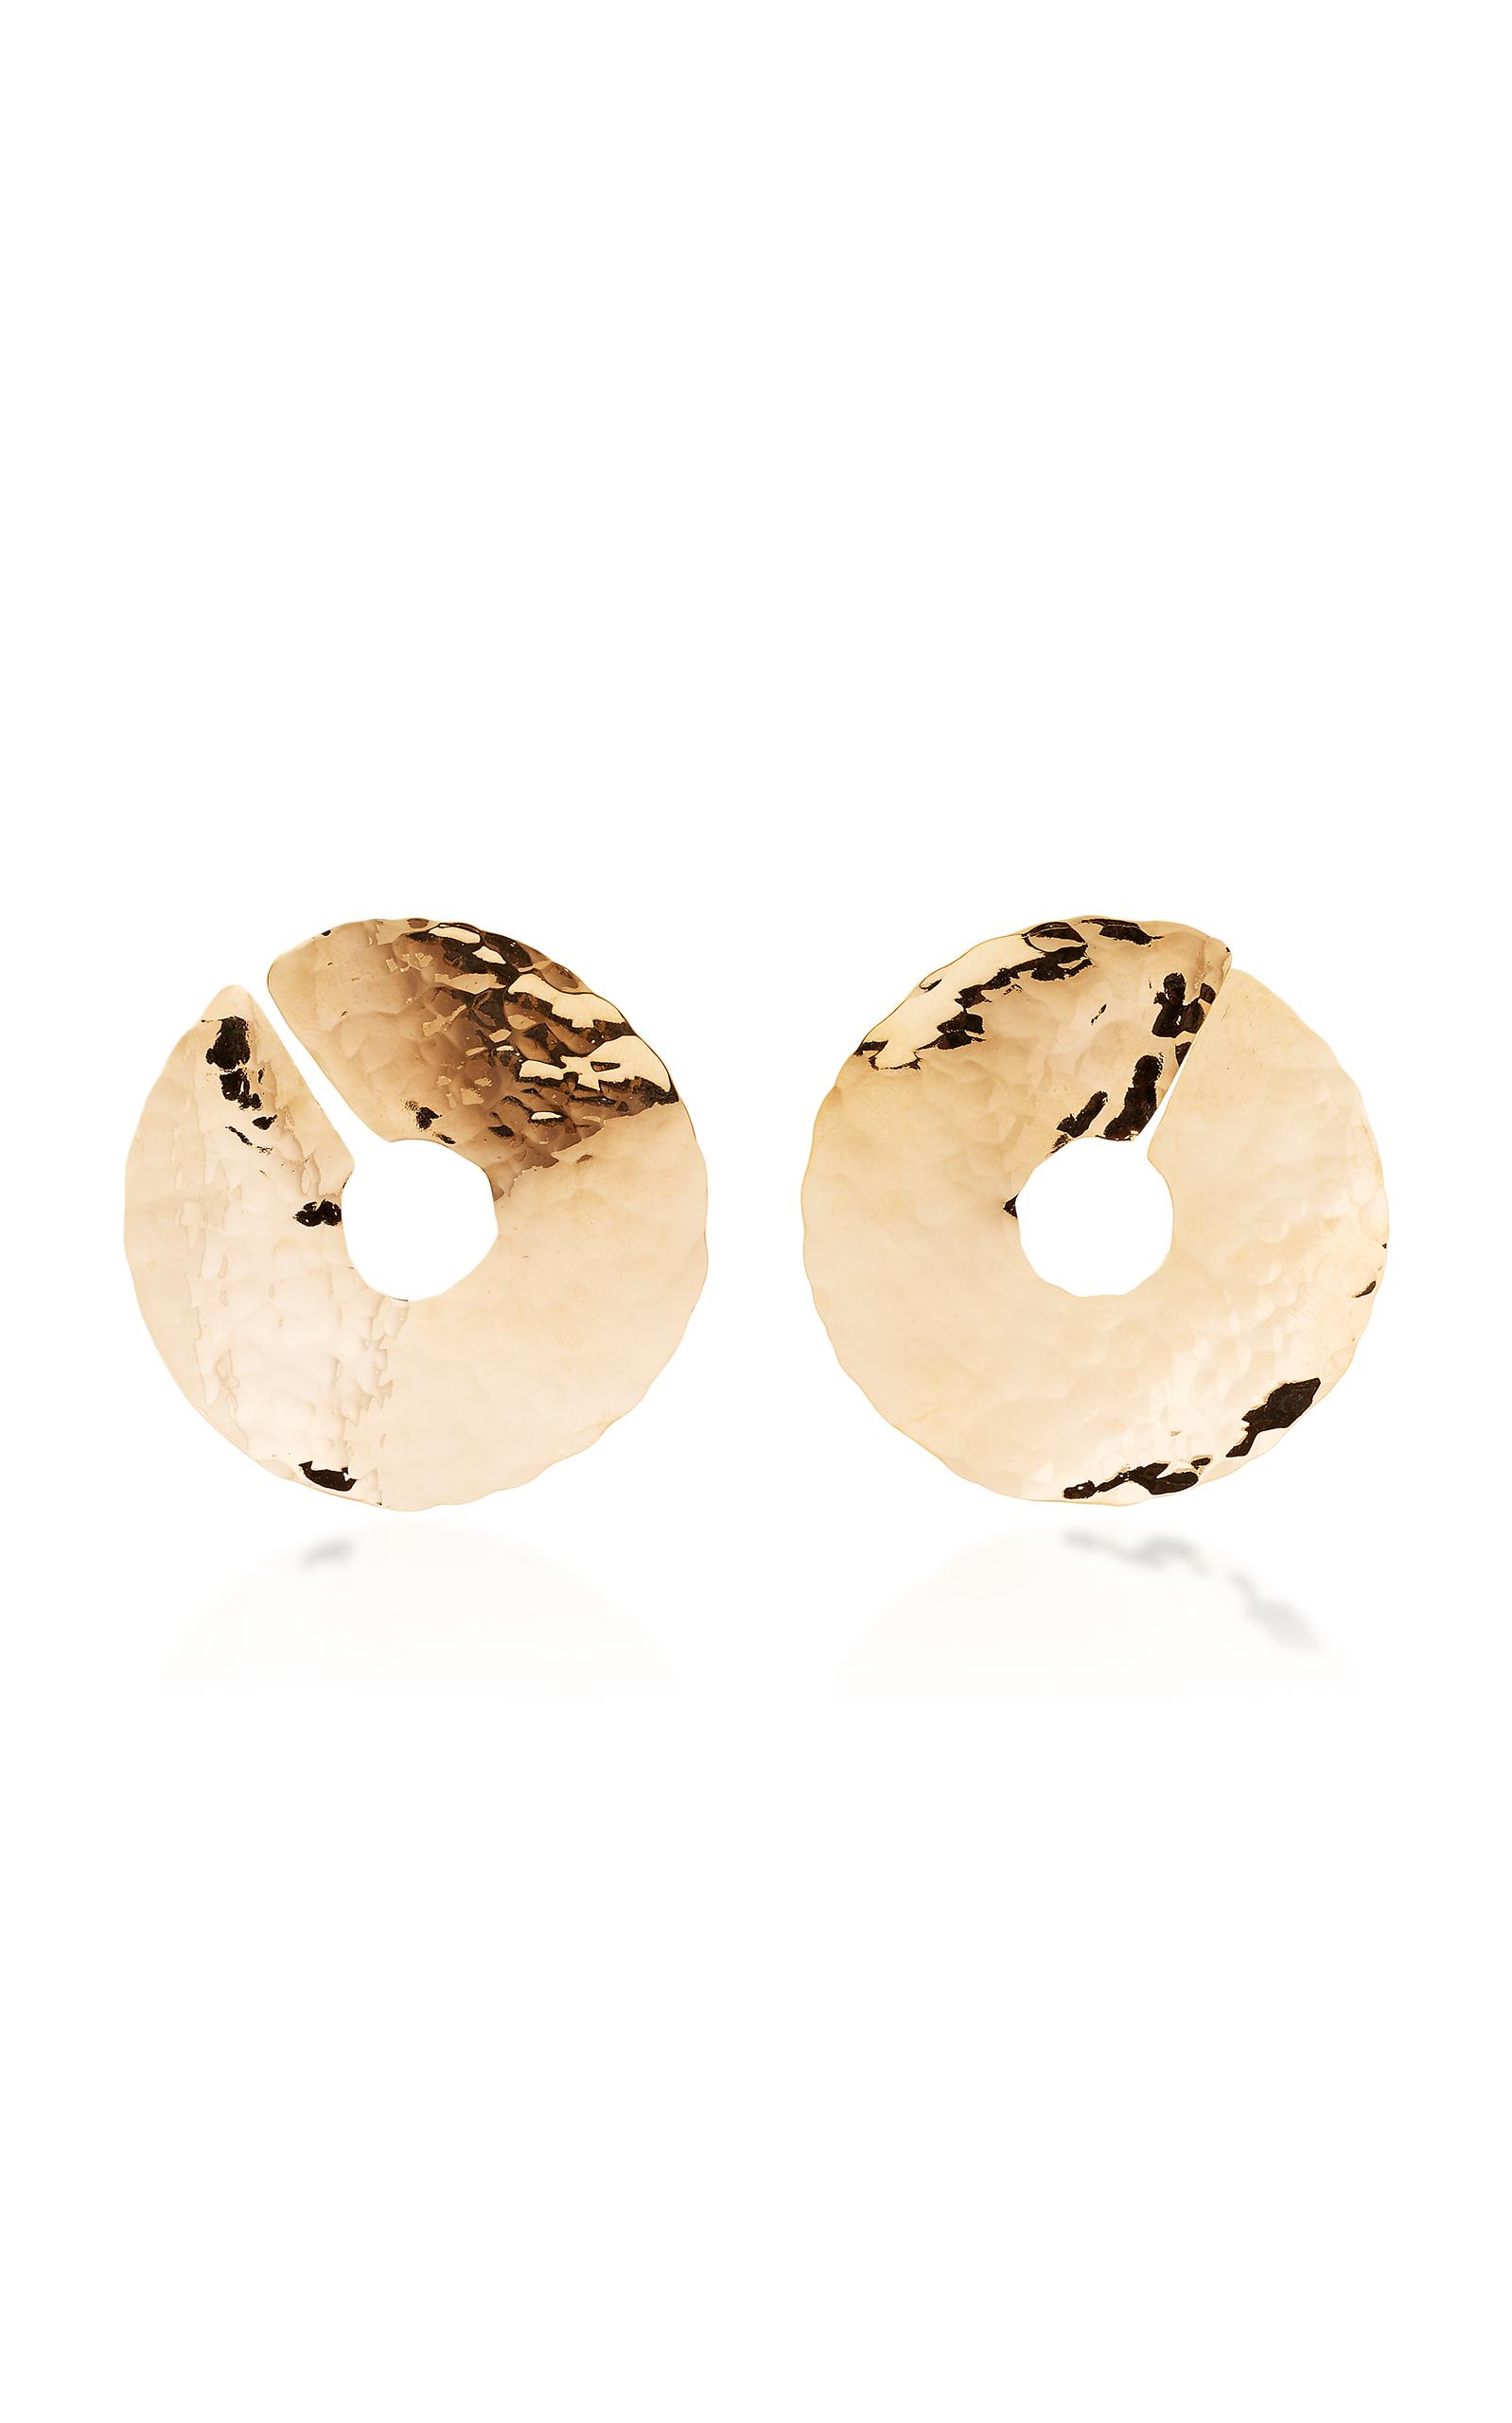 BIA DAIDONE JACKIE 24K GOLD-PLATED EARRINGS